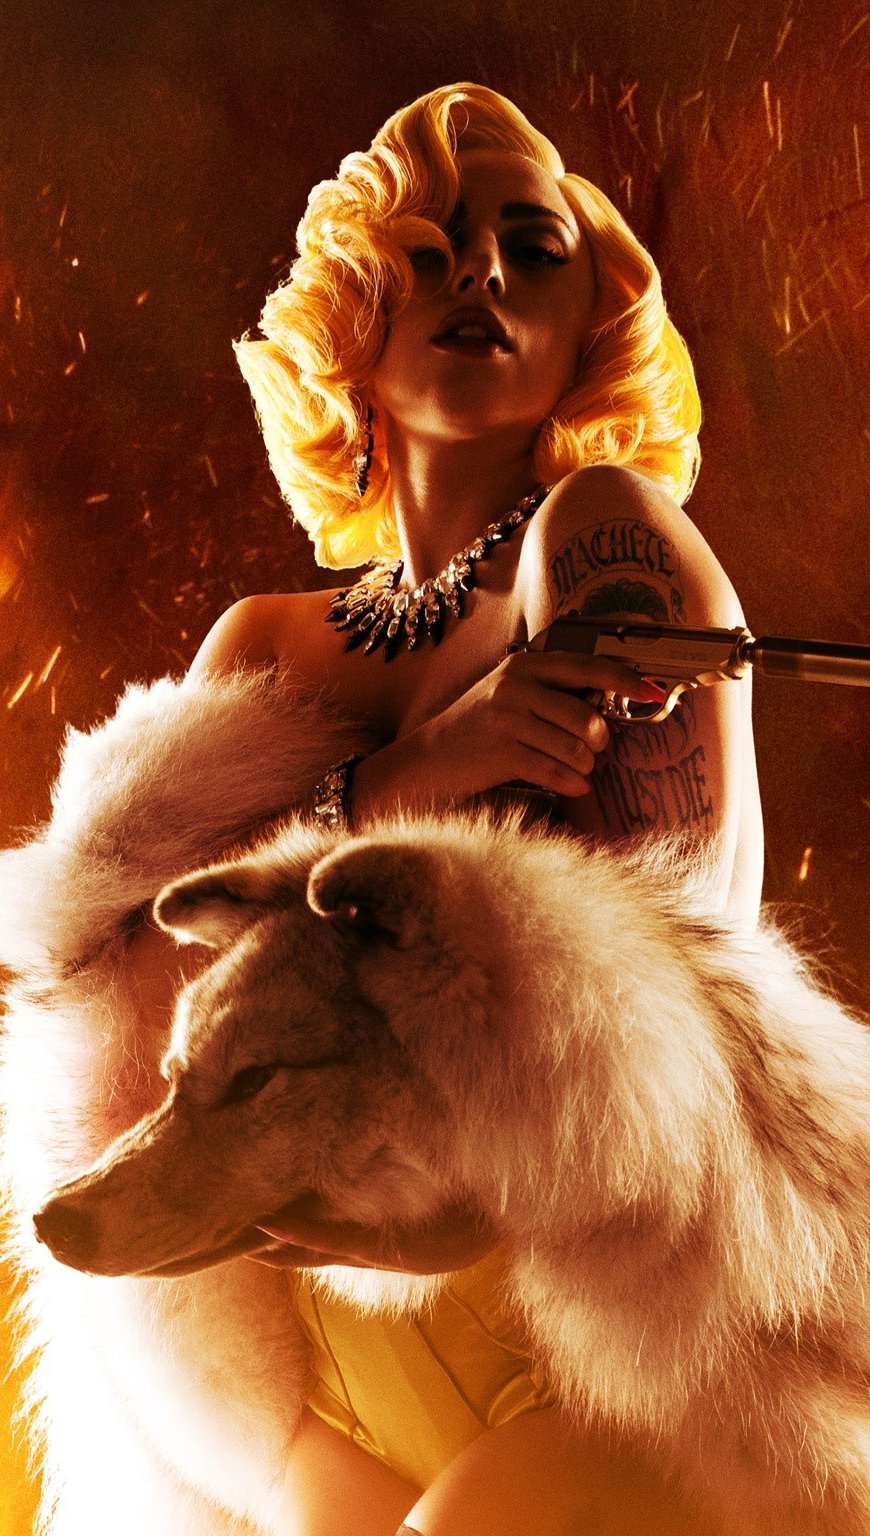 Fondos de pantalla Lady Gaga en Machete Kills Vertical